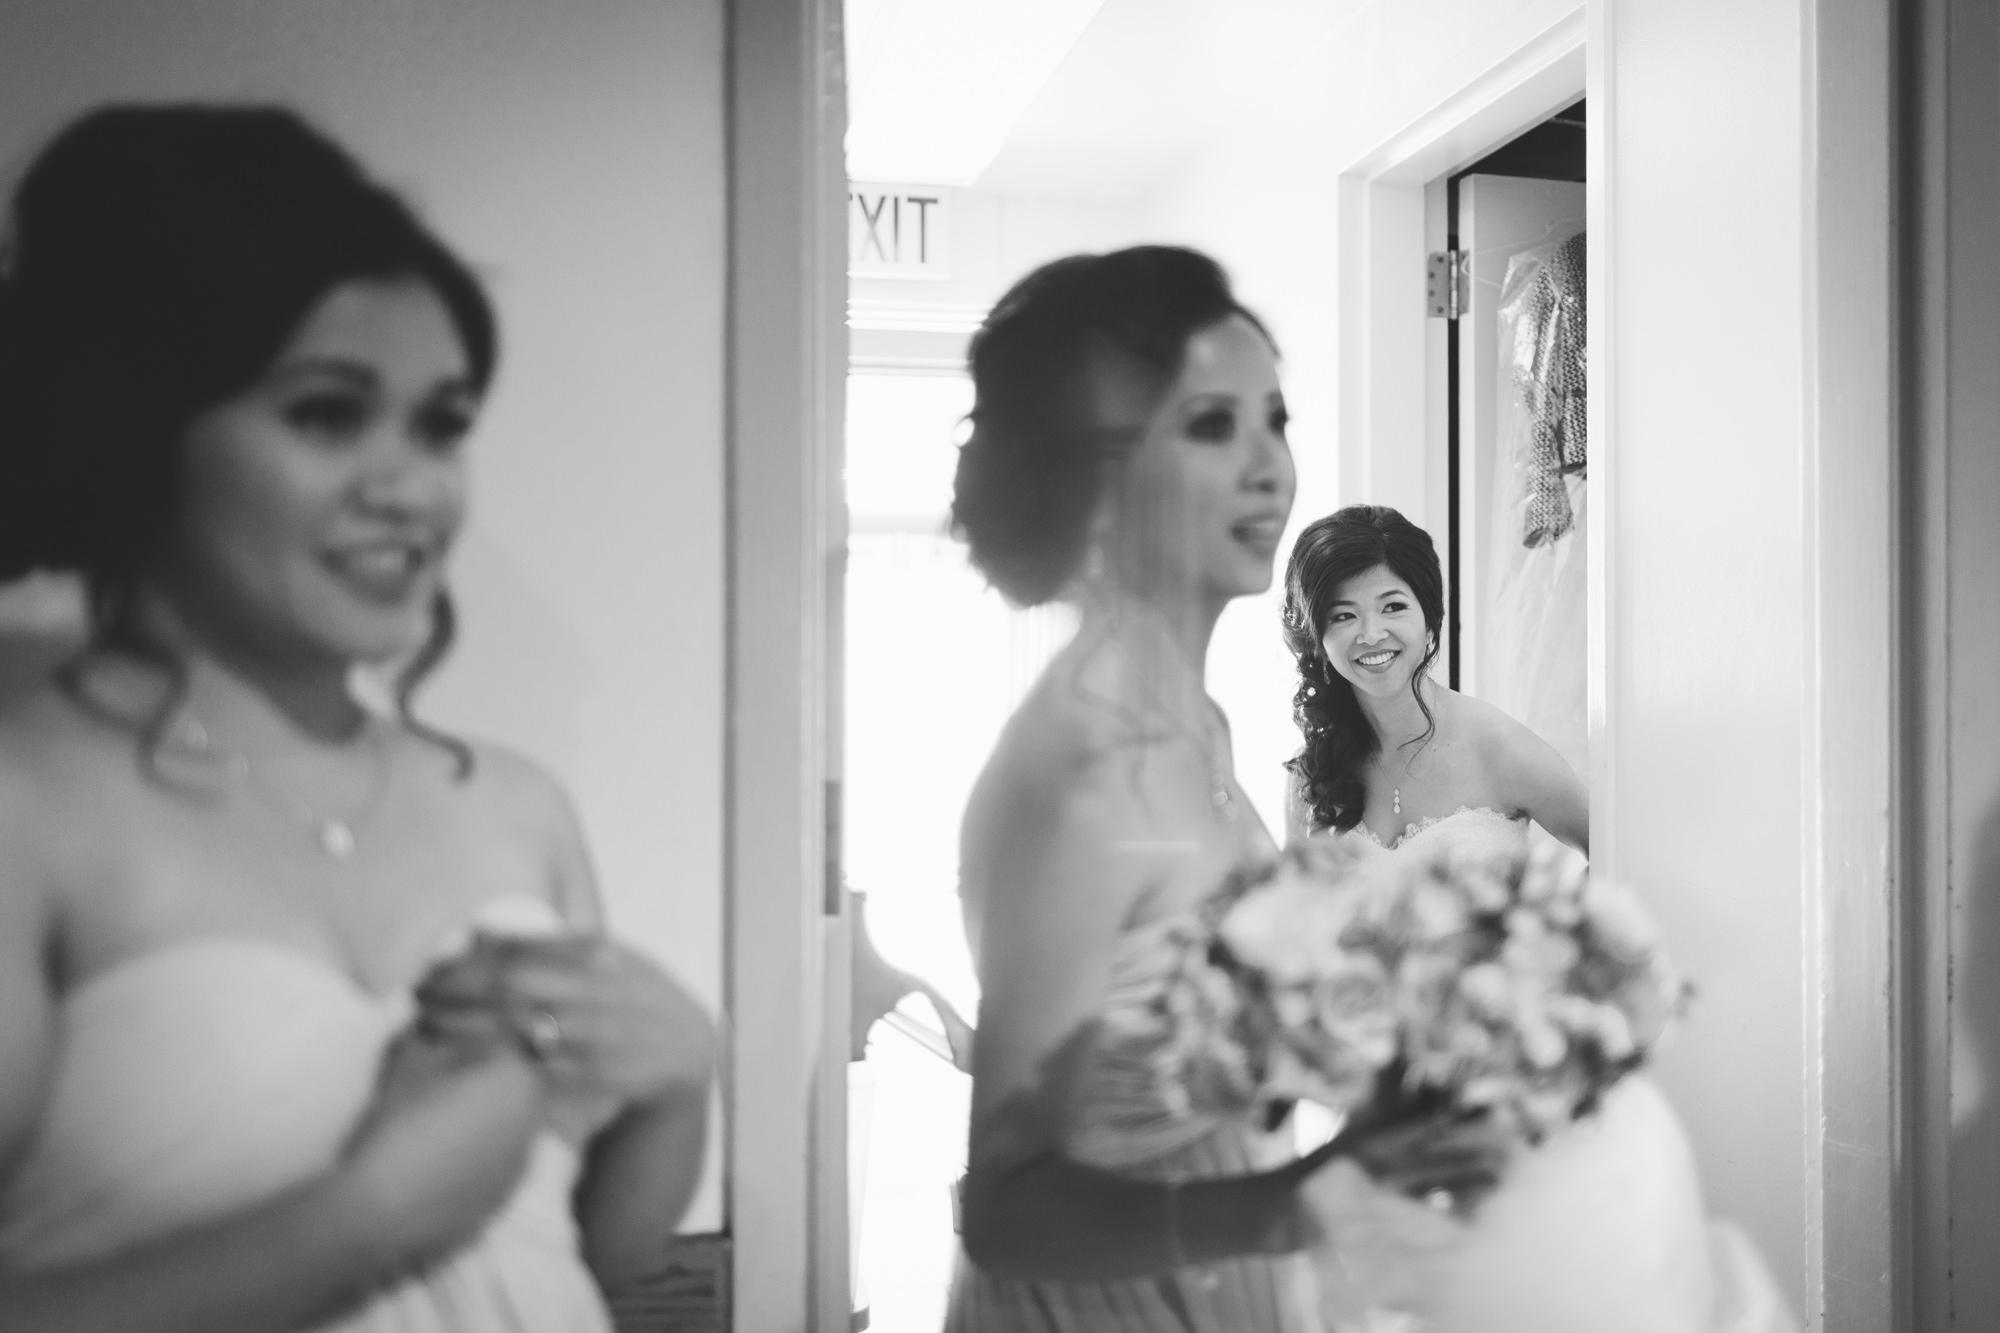 Alice_&_Aaron_Wedding_by_The_Light_&_Glass_Photography-048.jpg